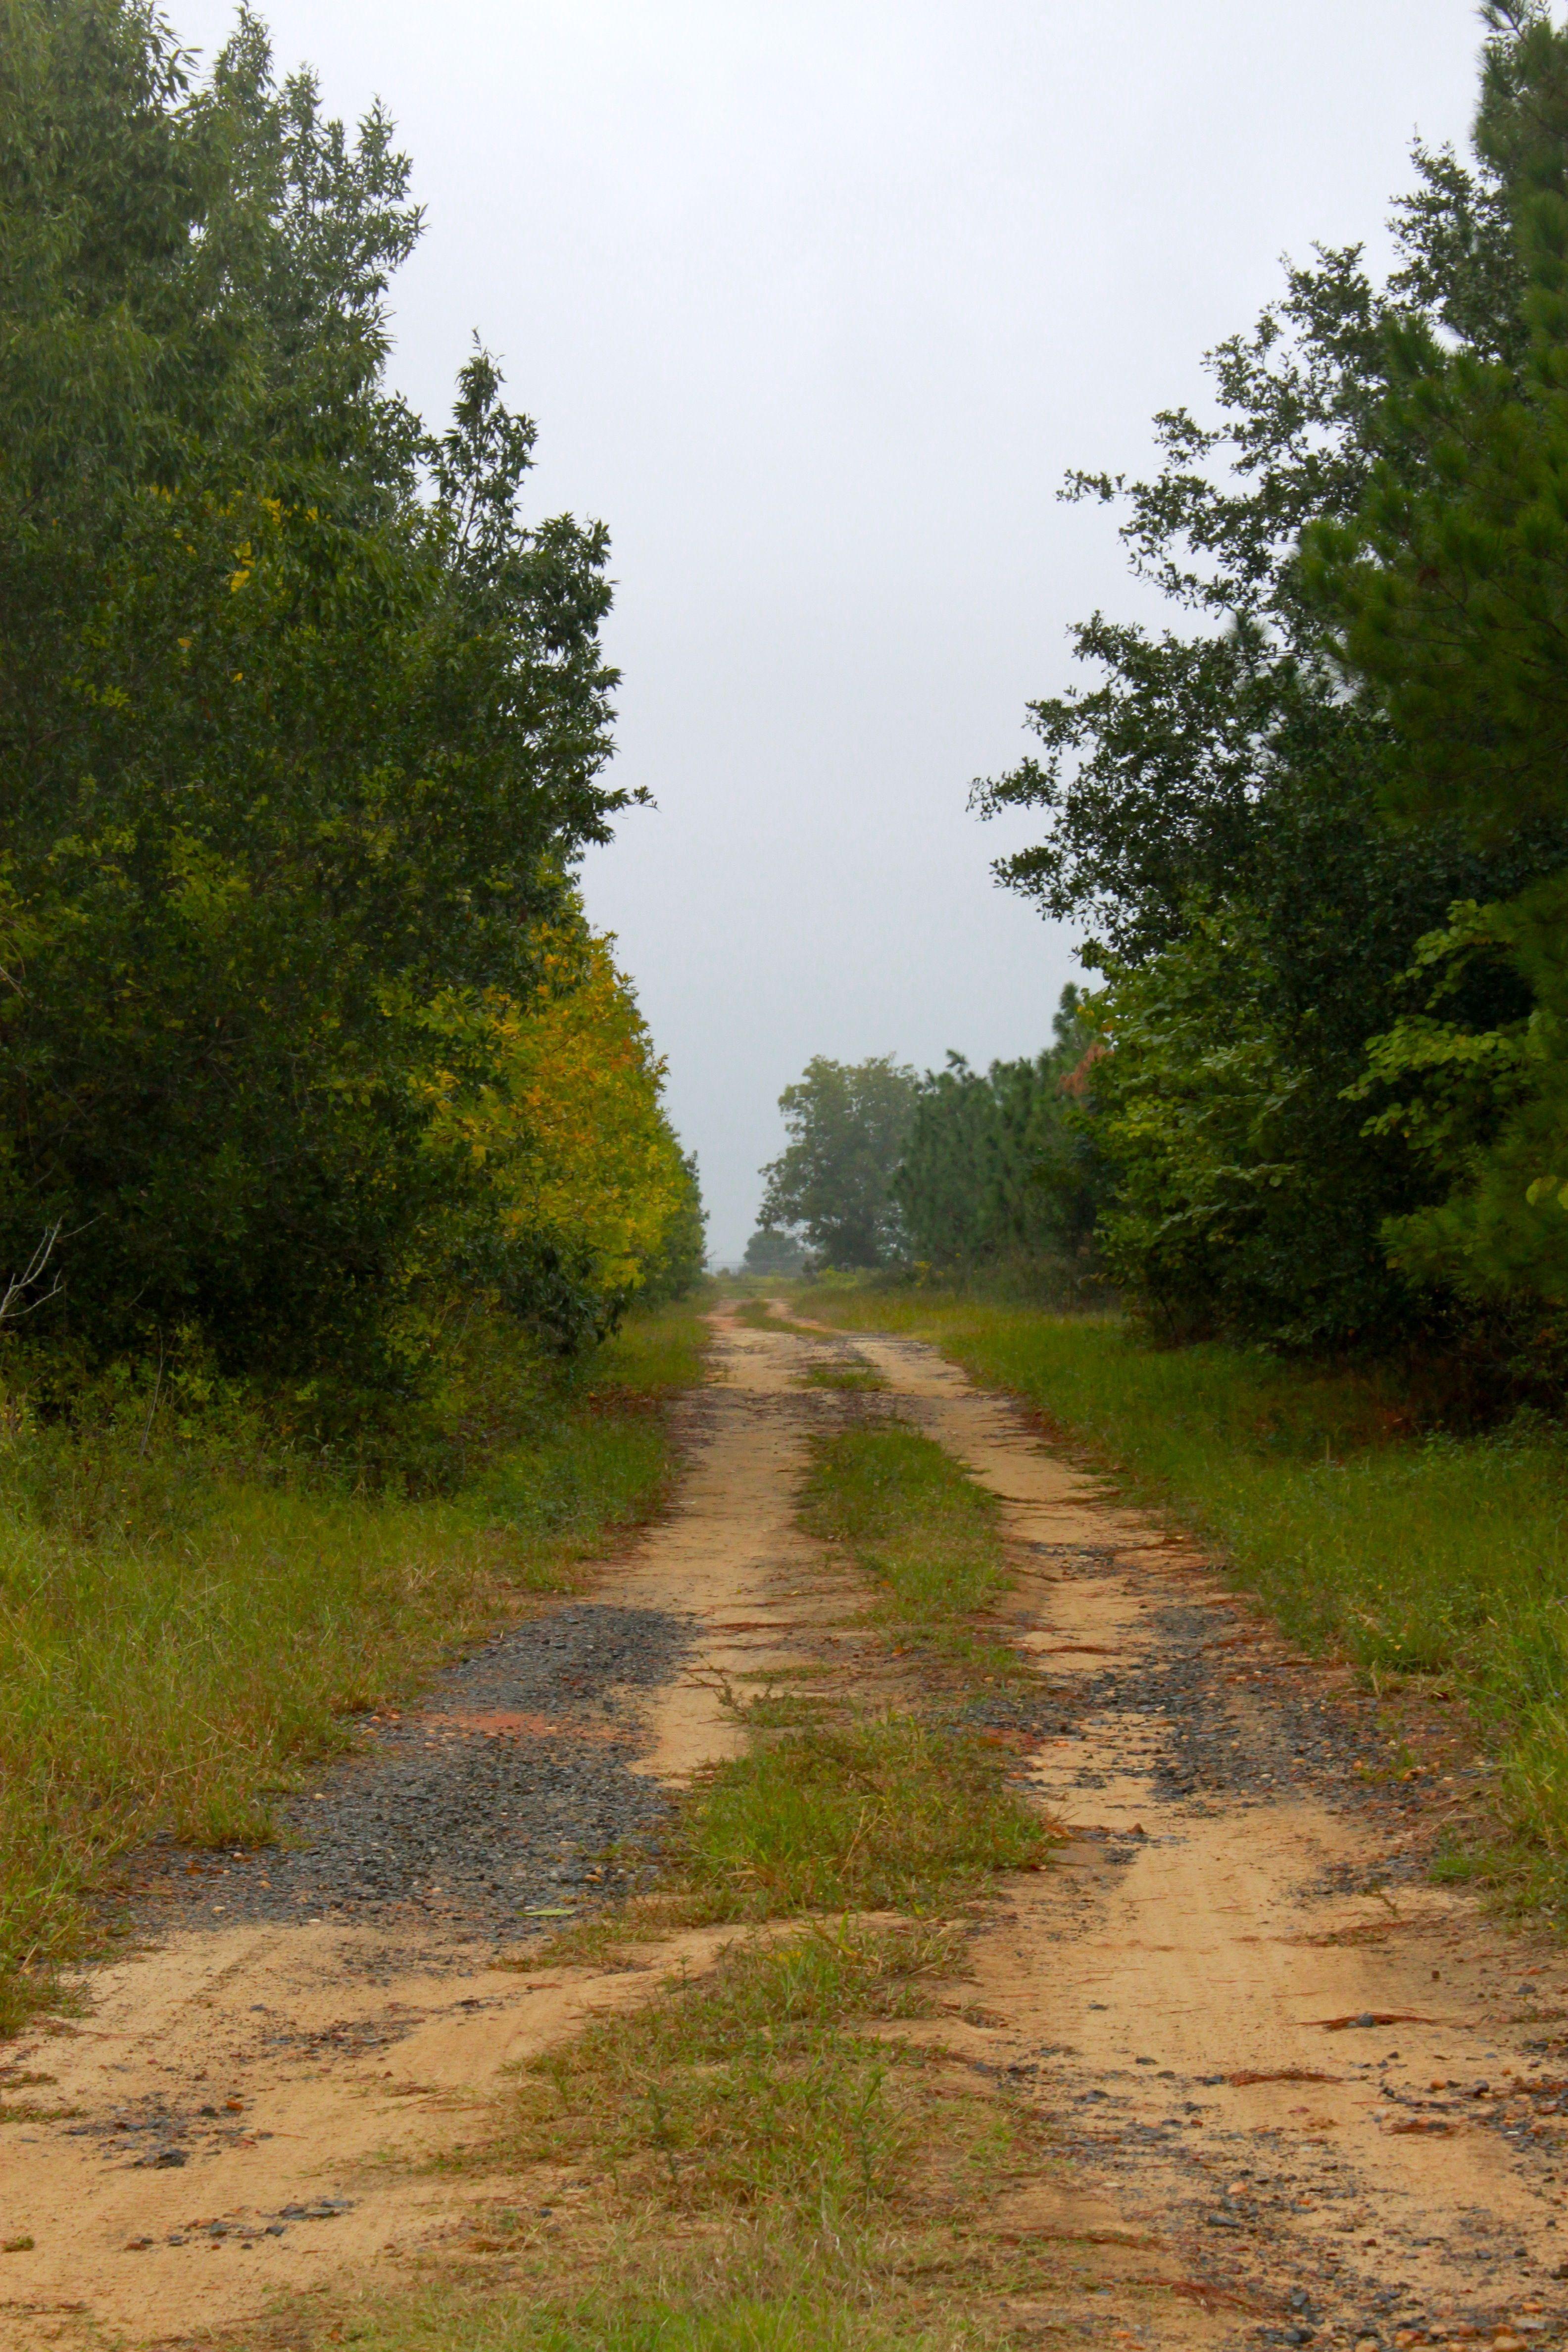 Georgia - Interstate 20 Westbound | Cross Country Roads |Georgia Country Roads